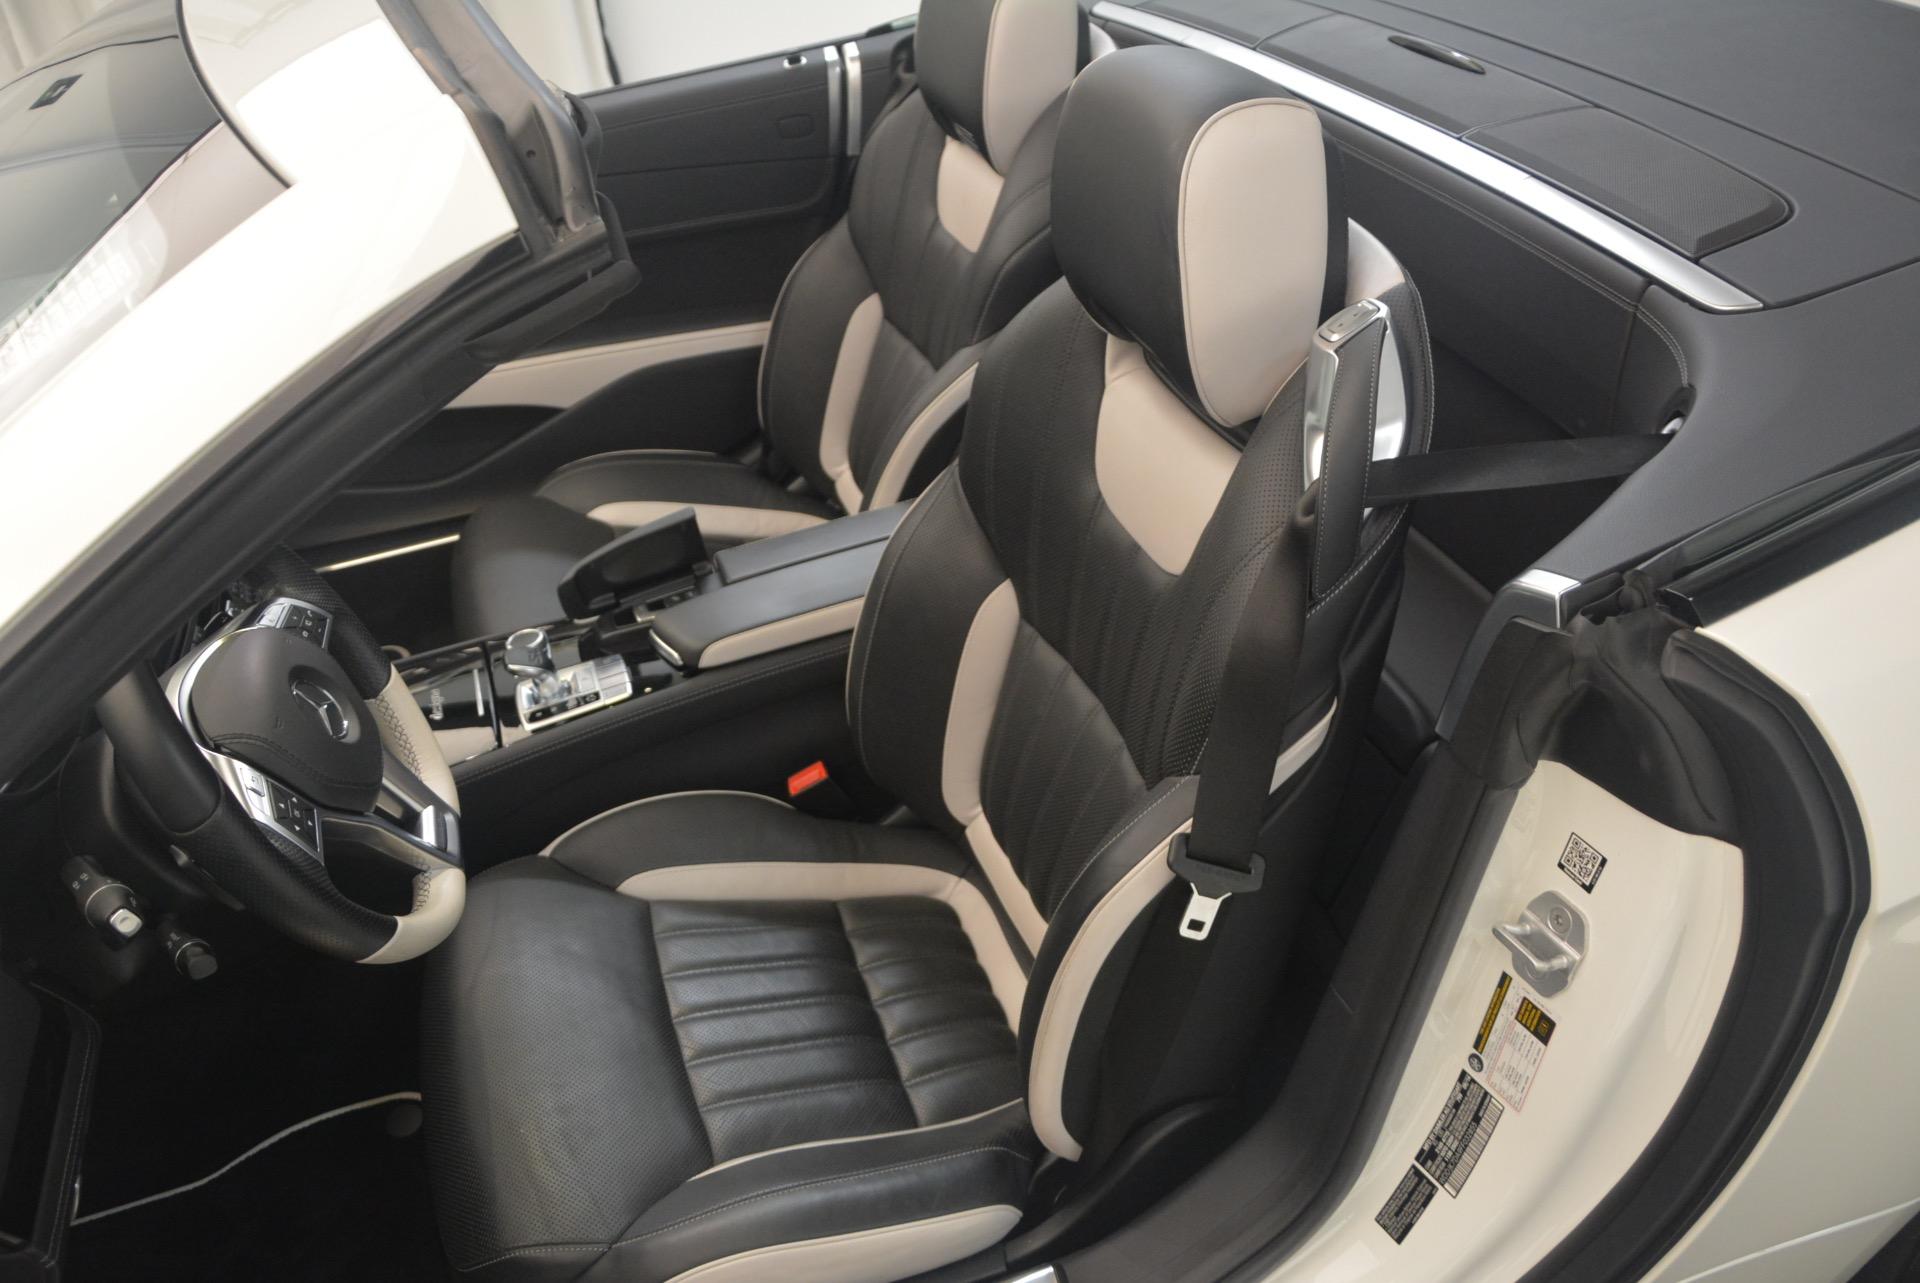 Used 2015 Mercedes Benz SL-Class SL 550 For Sale In Greenwich, CT. Alfa Romeo of Greenwich, M1874A 1261_p30